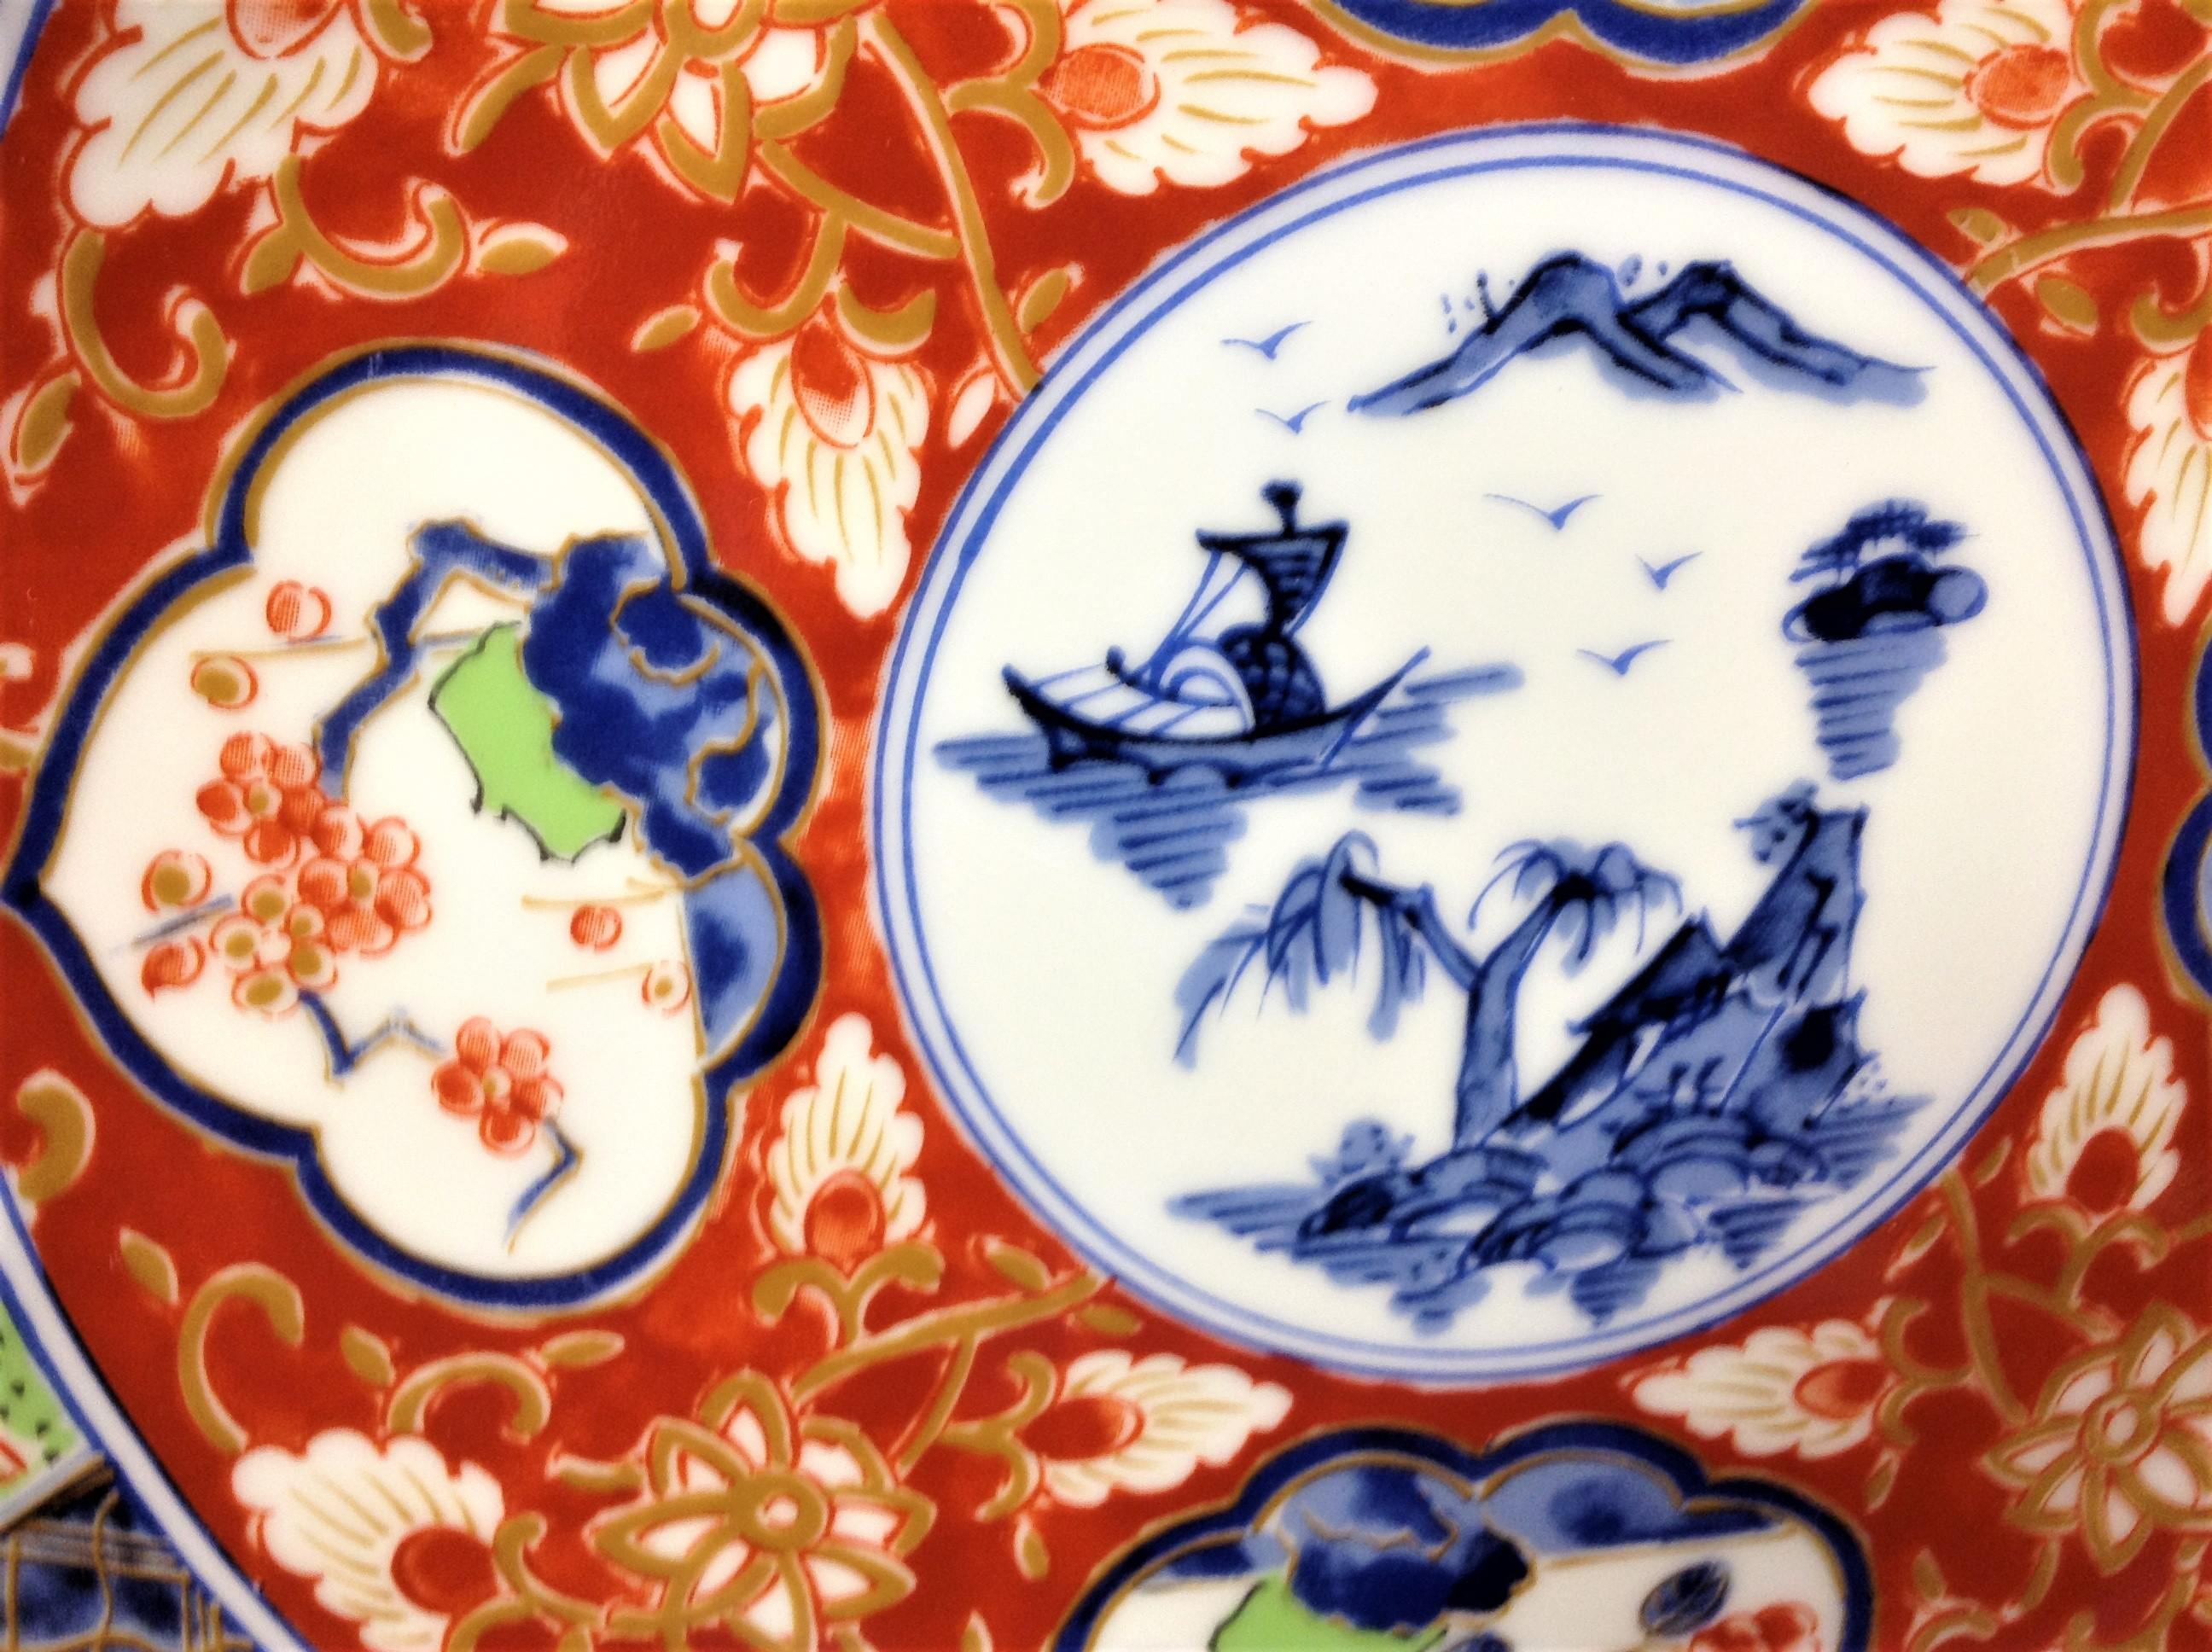 Porcelain Asian Cups \u0026 Plates - Set of 8 - Image 3 ...  sc 1 st  Chairish & Porcelain Asian Cups \u0026 Plates - Set of 8 | Chairish